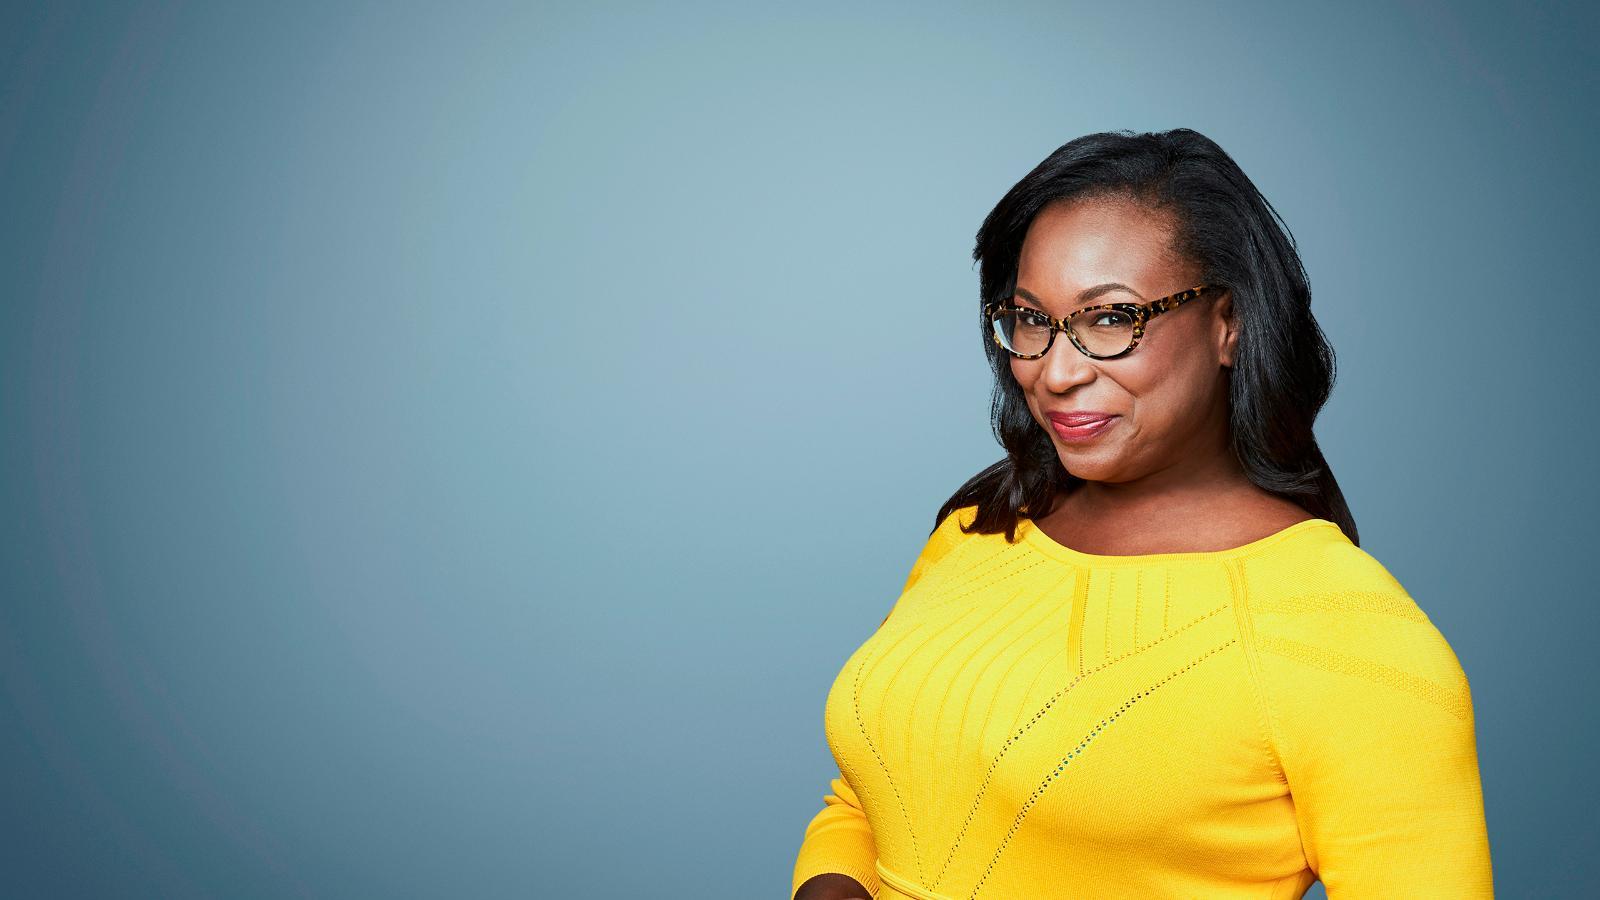 CNN Profiles - Melody Taylor - Executive Producer, HLN - CNN